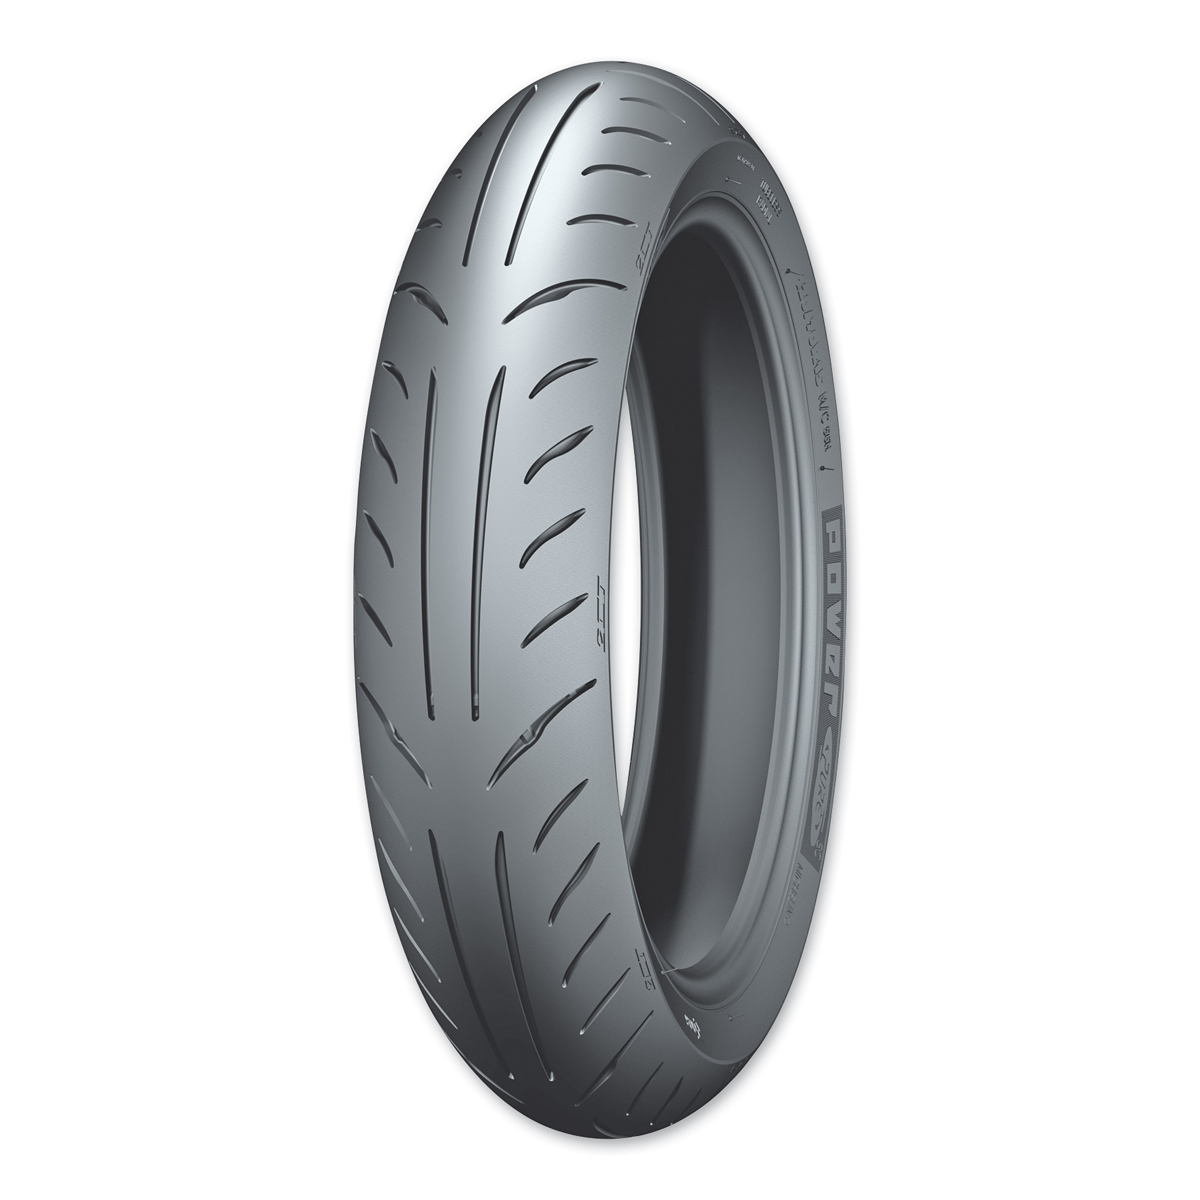 Michelin Power Pure SC 120/70-13 Front Tire